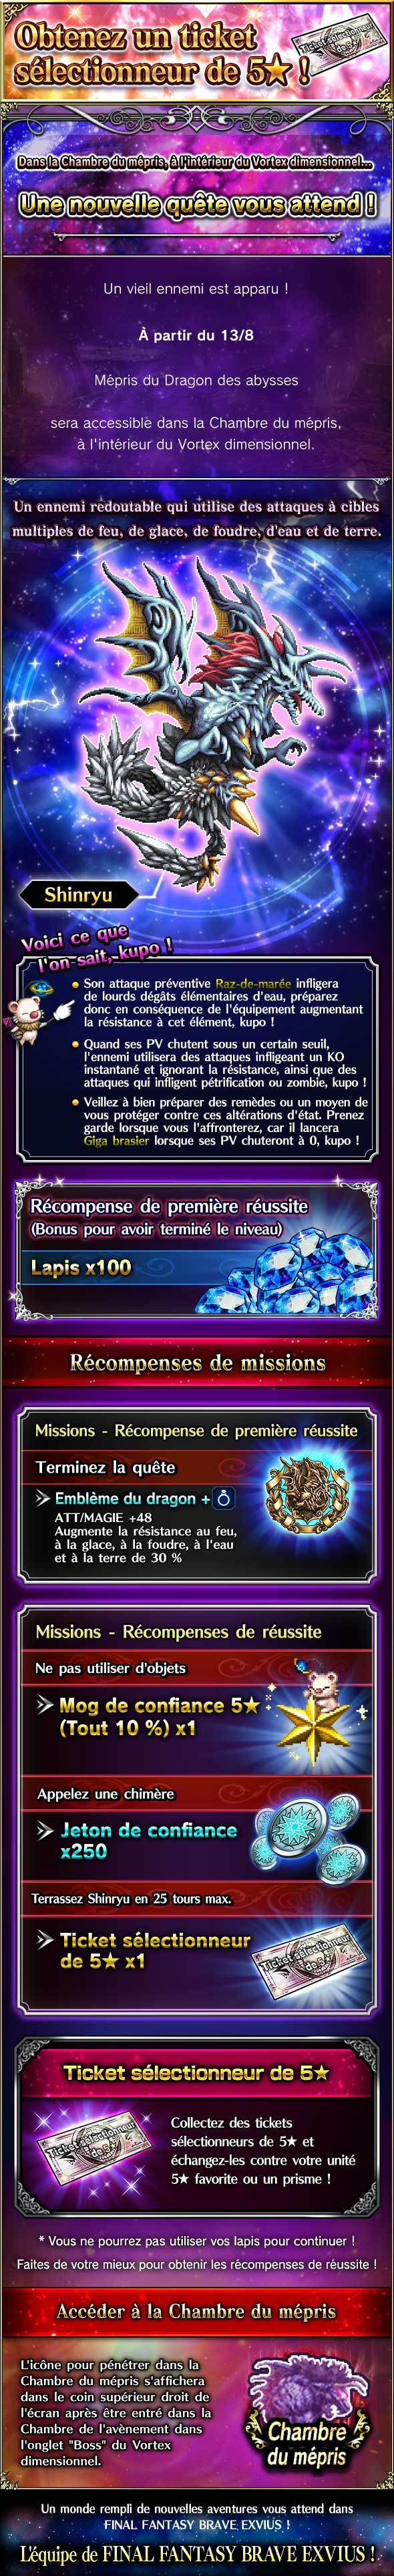 Trial - Mépris du Dragon des abysses - a partir du 13/08/20 20200811ScornoftheDragonoftheAbyss